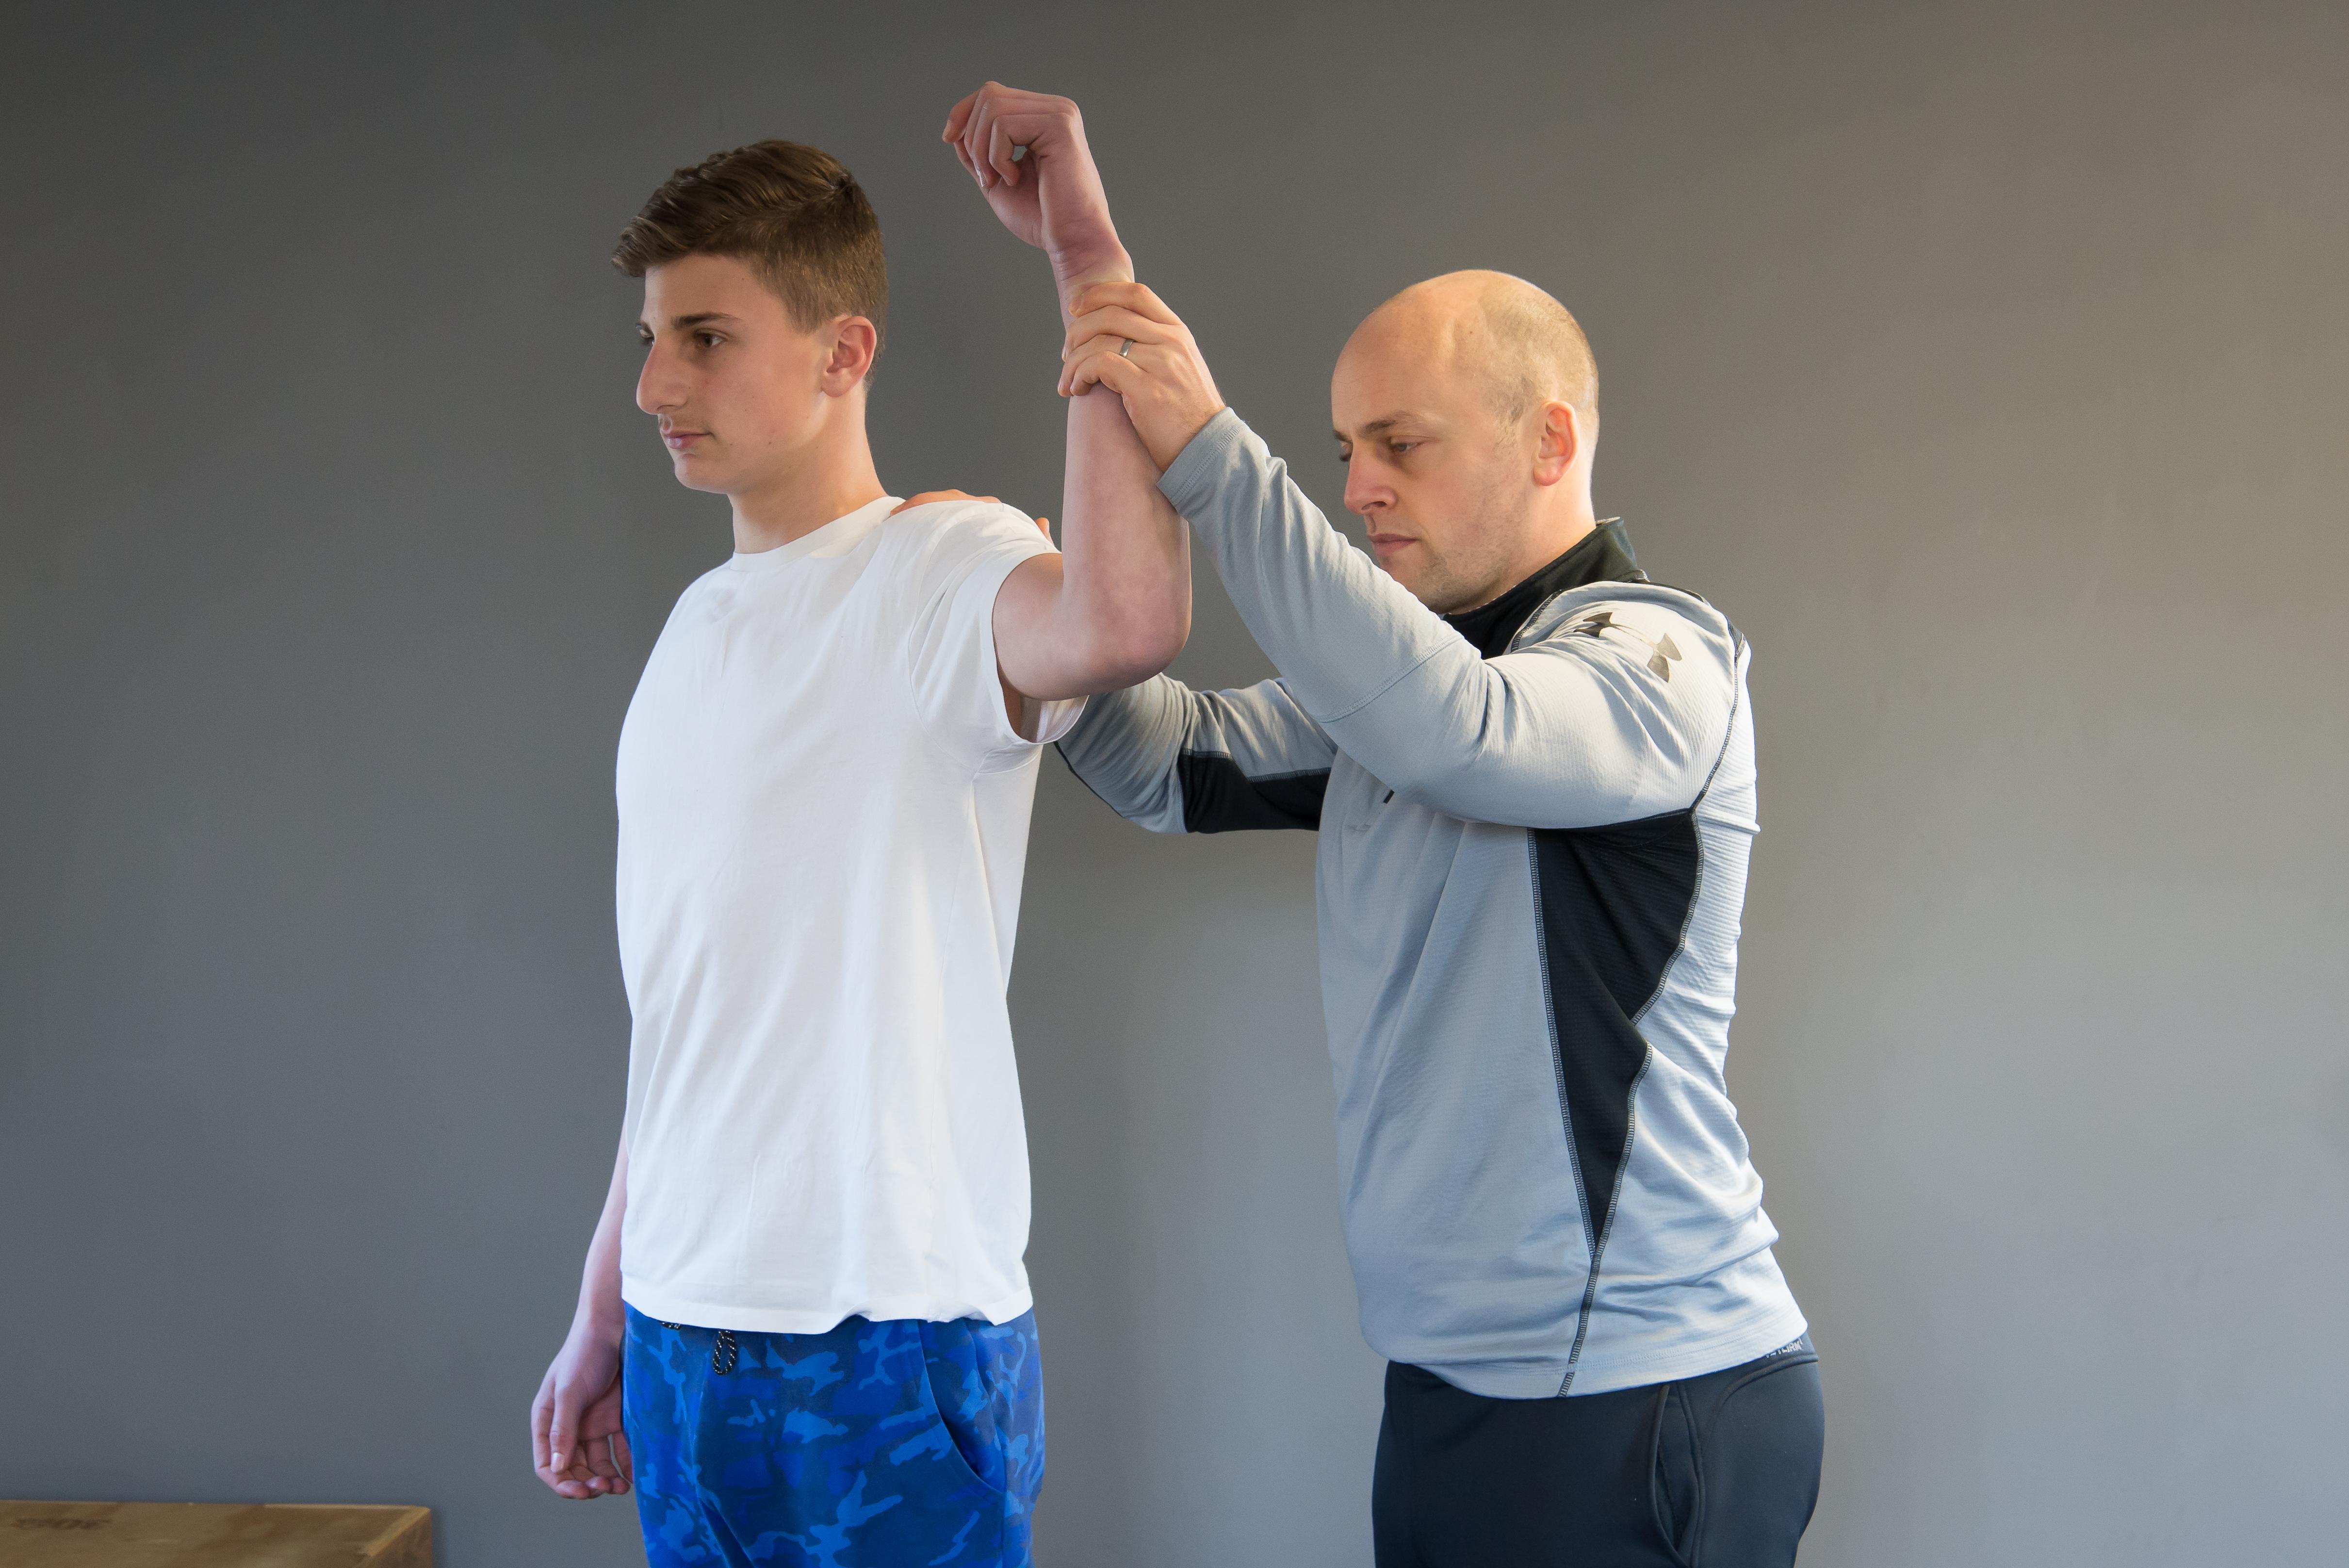 Personal training injury rehab shoulder Ware